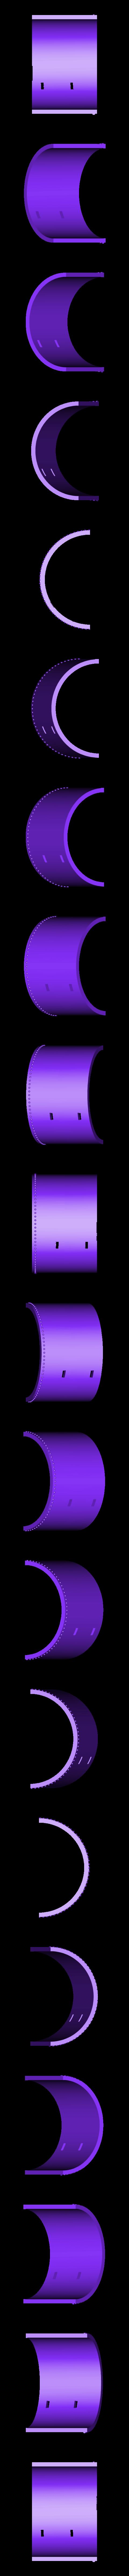 Boiler_Section_2_-_SCALED_Part_2.STL Download free STL file 4-8-8-4 Big Boy Locomotive • 3D printer object, RaymondDeLuca